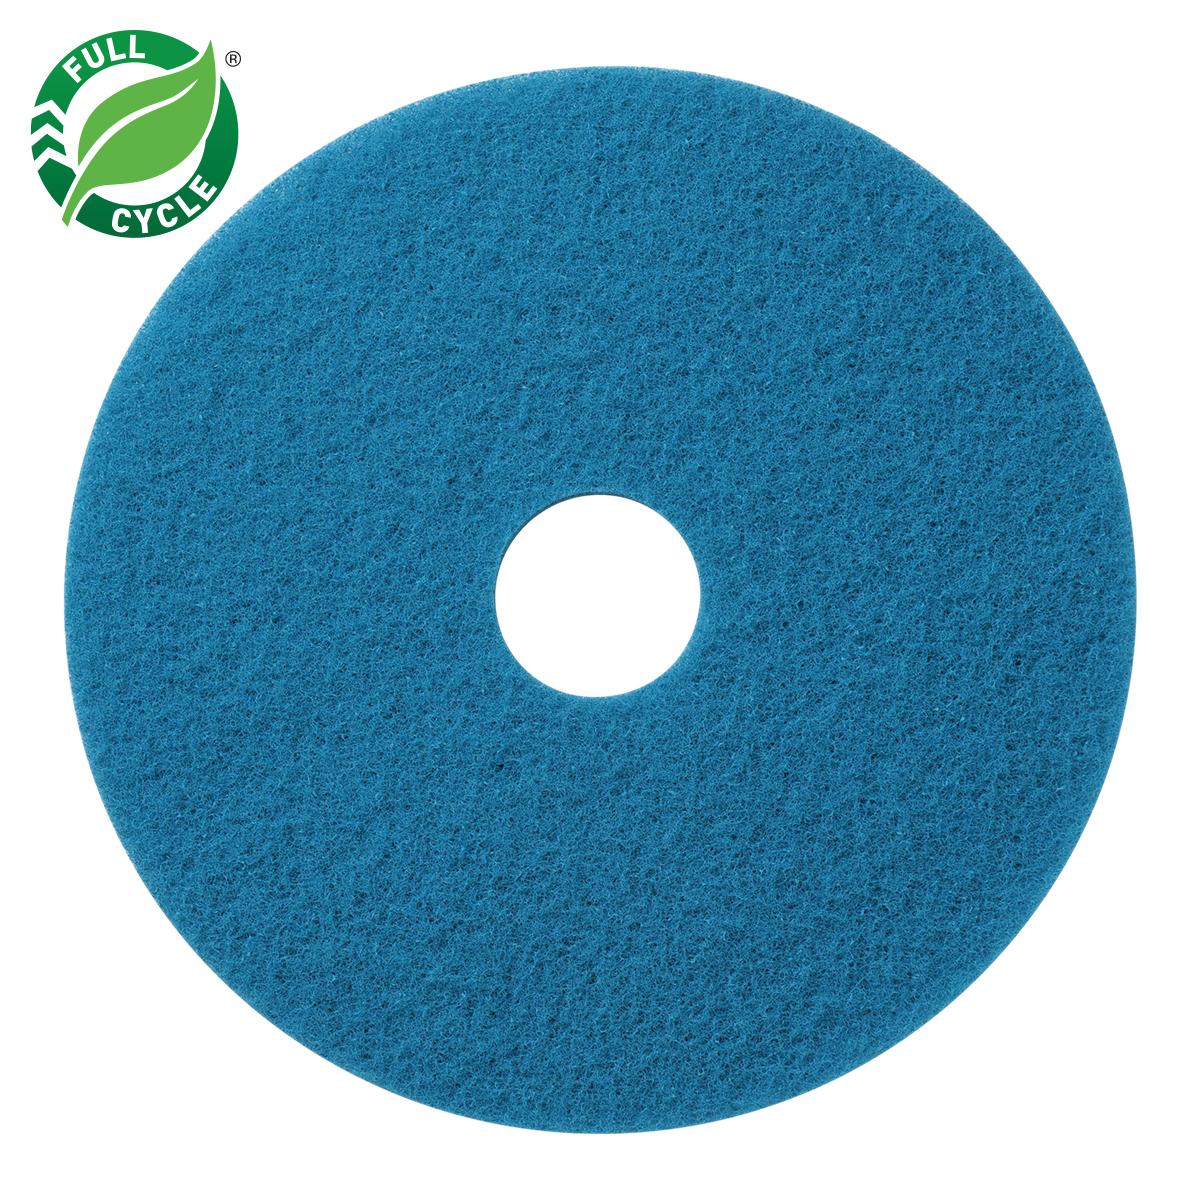 "10"" Blue Scrub Floor Pads, 5/cs"